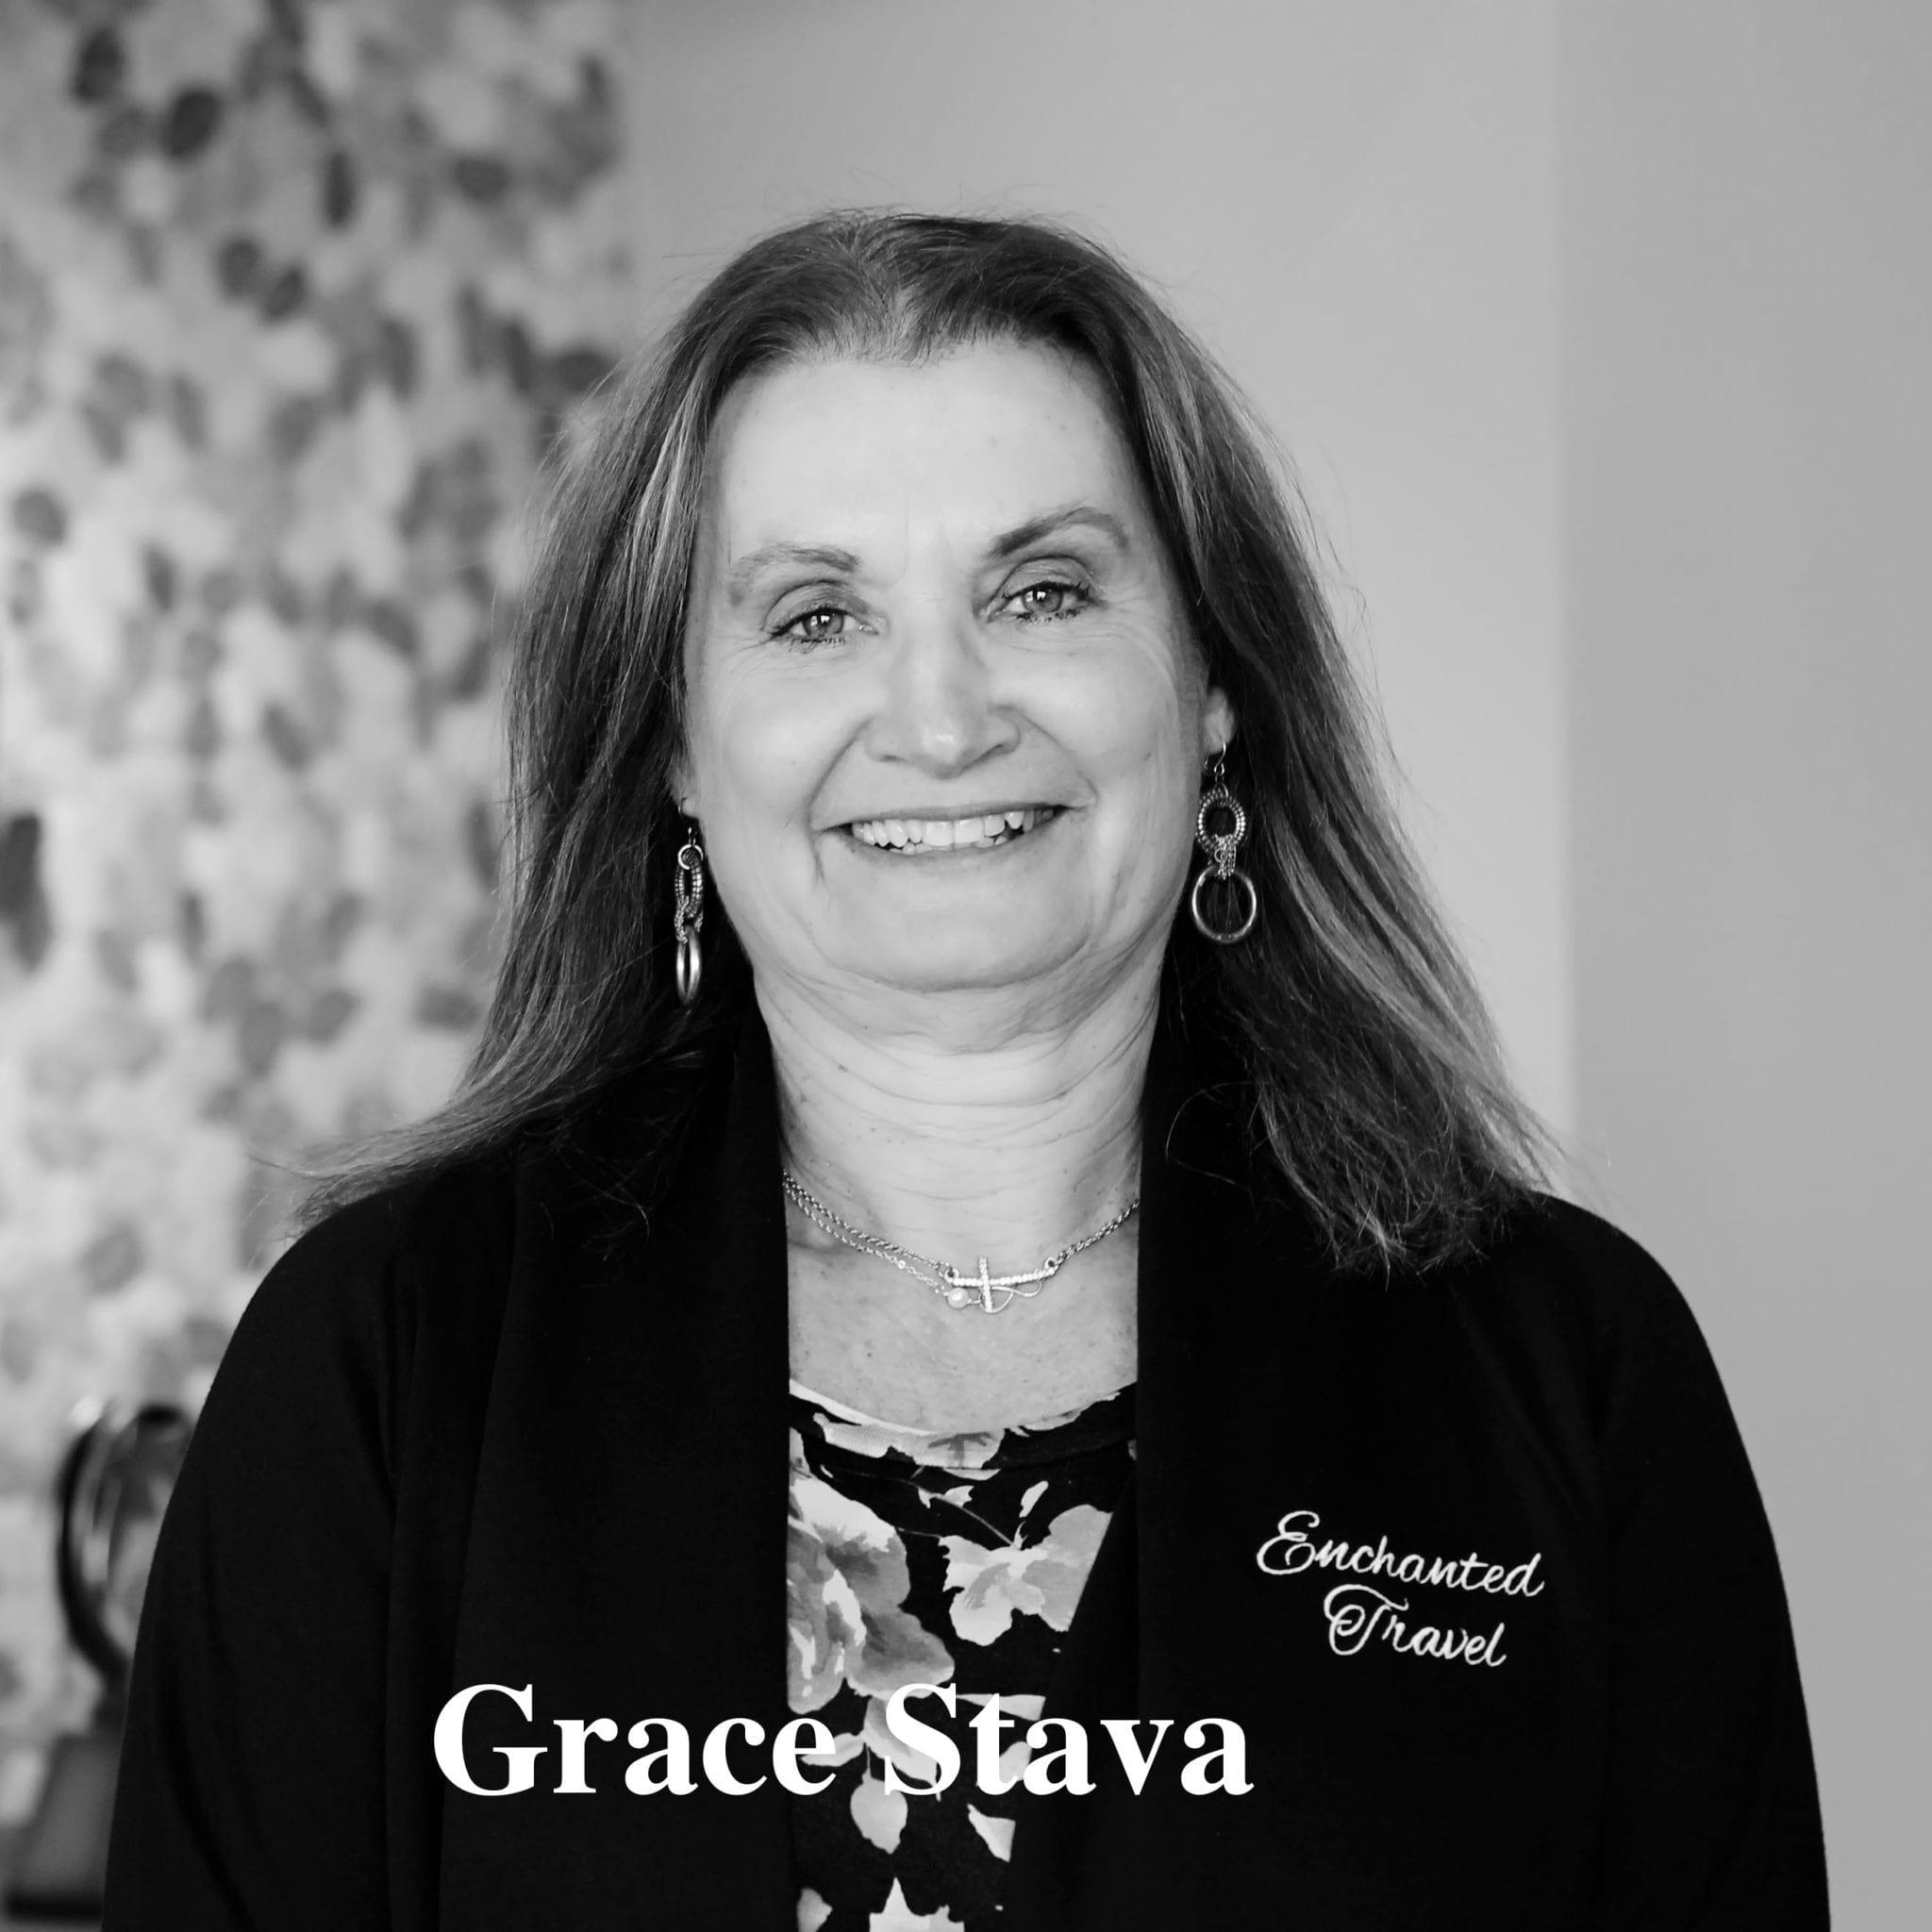 Grace Stava